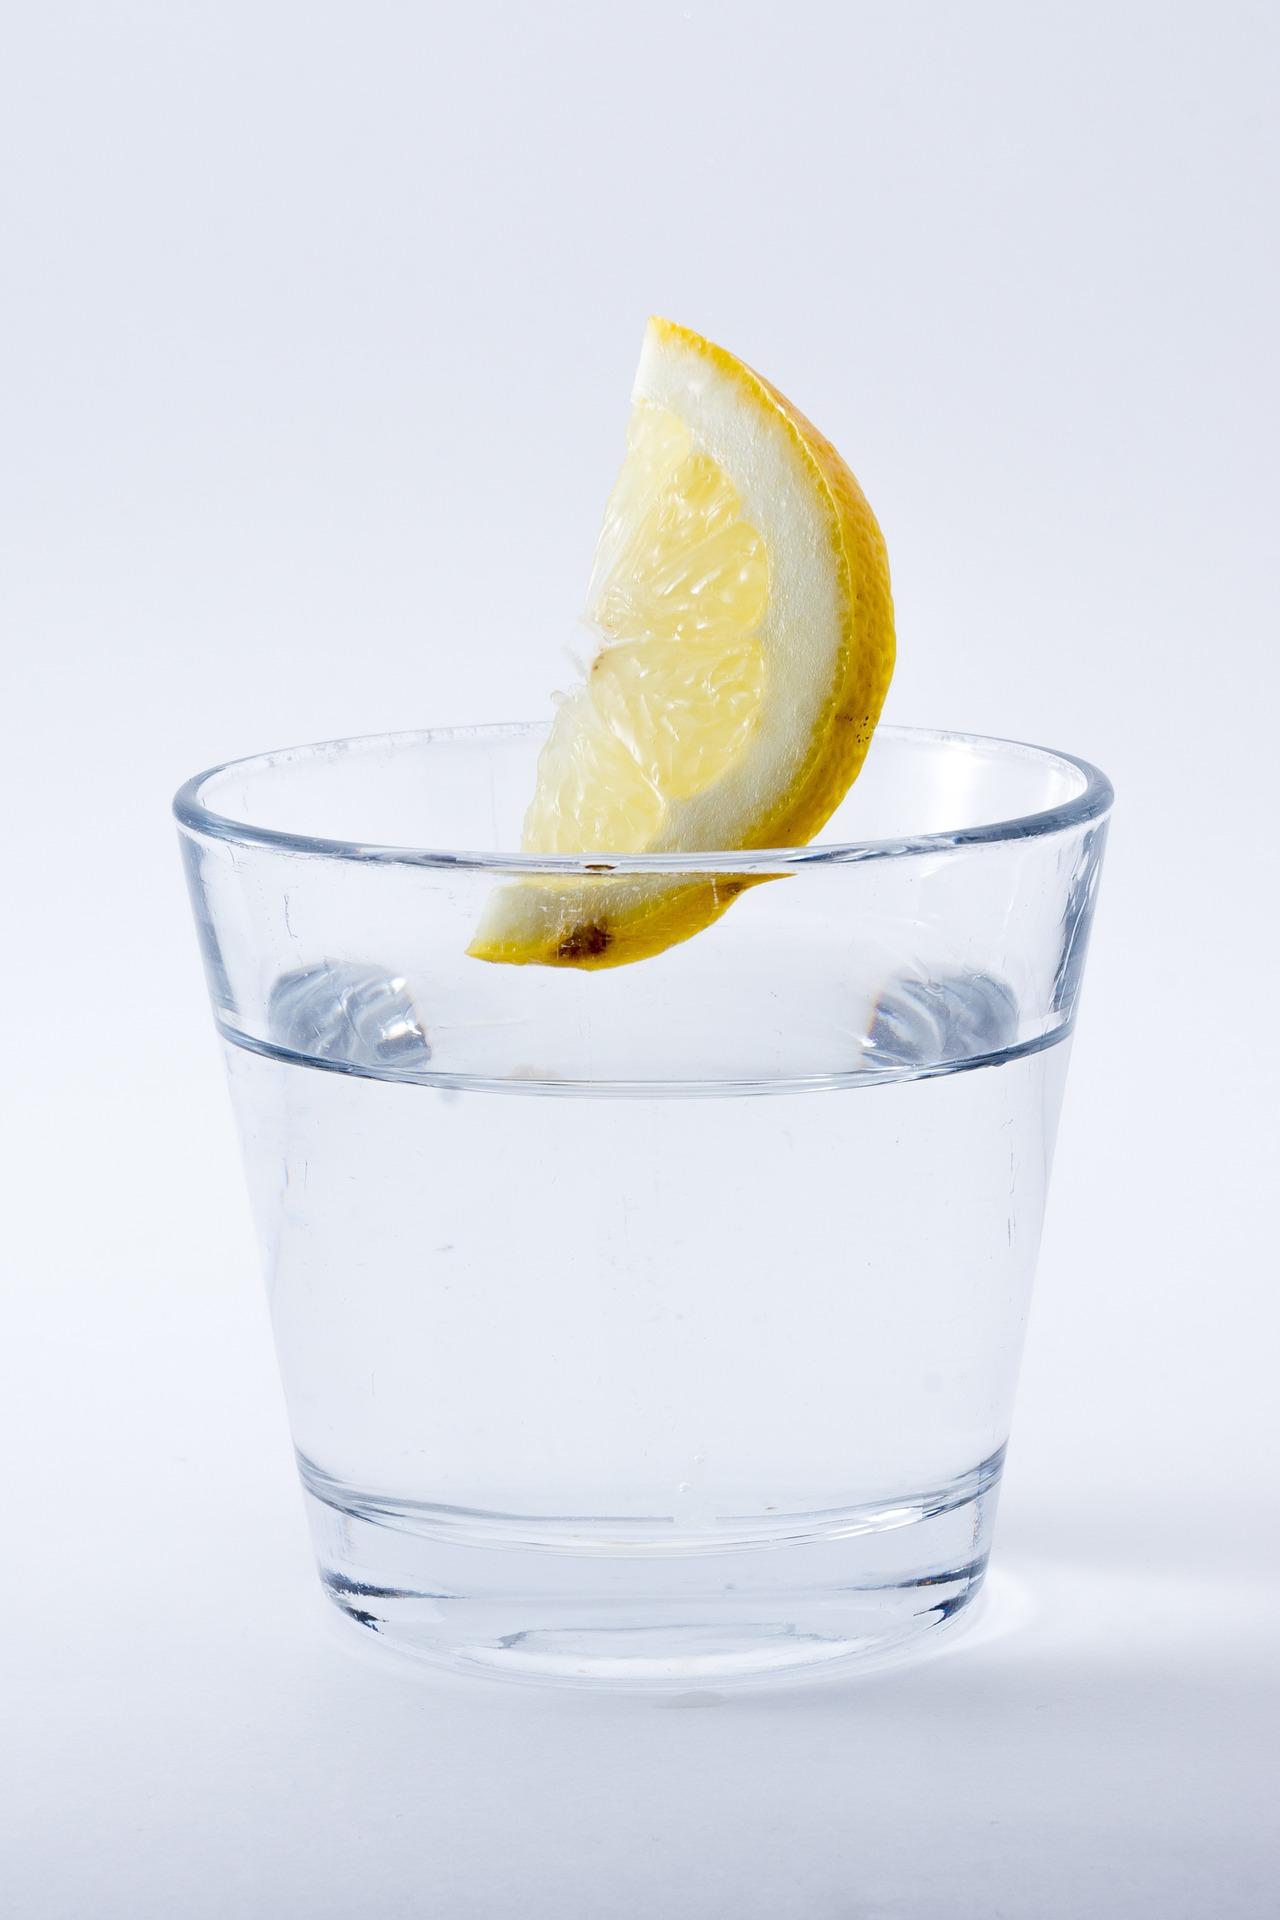 7 Reasons you should drink lemon water each day